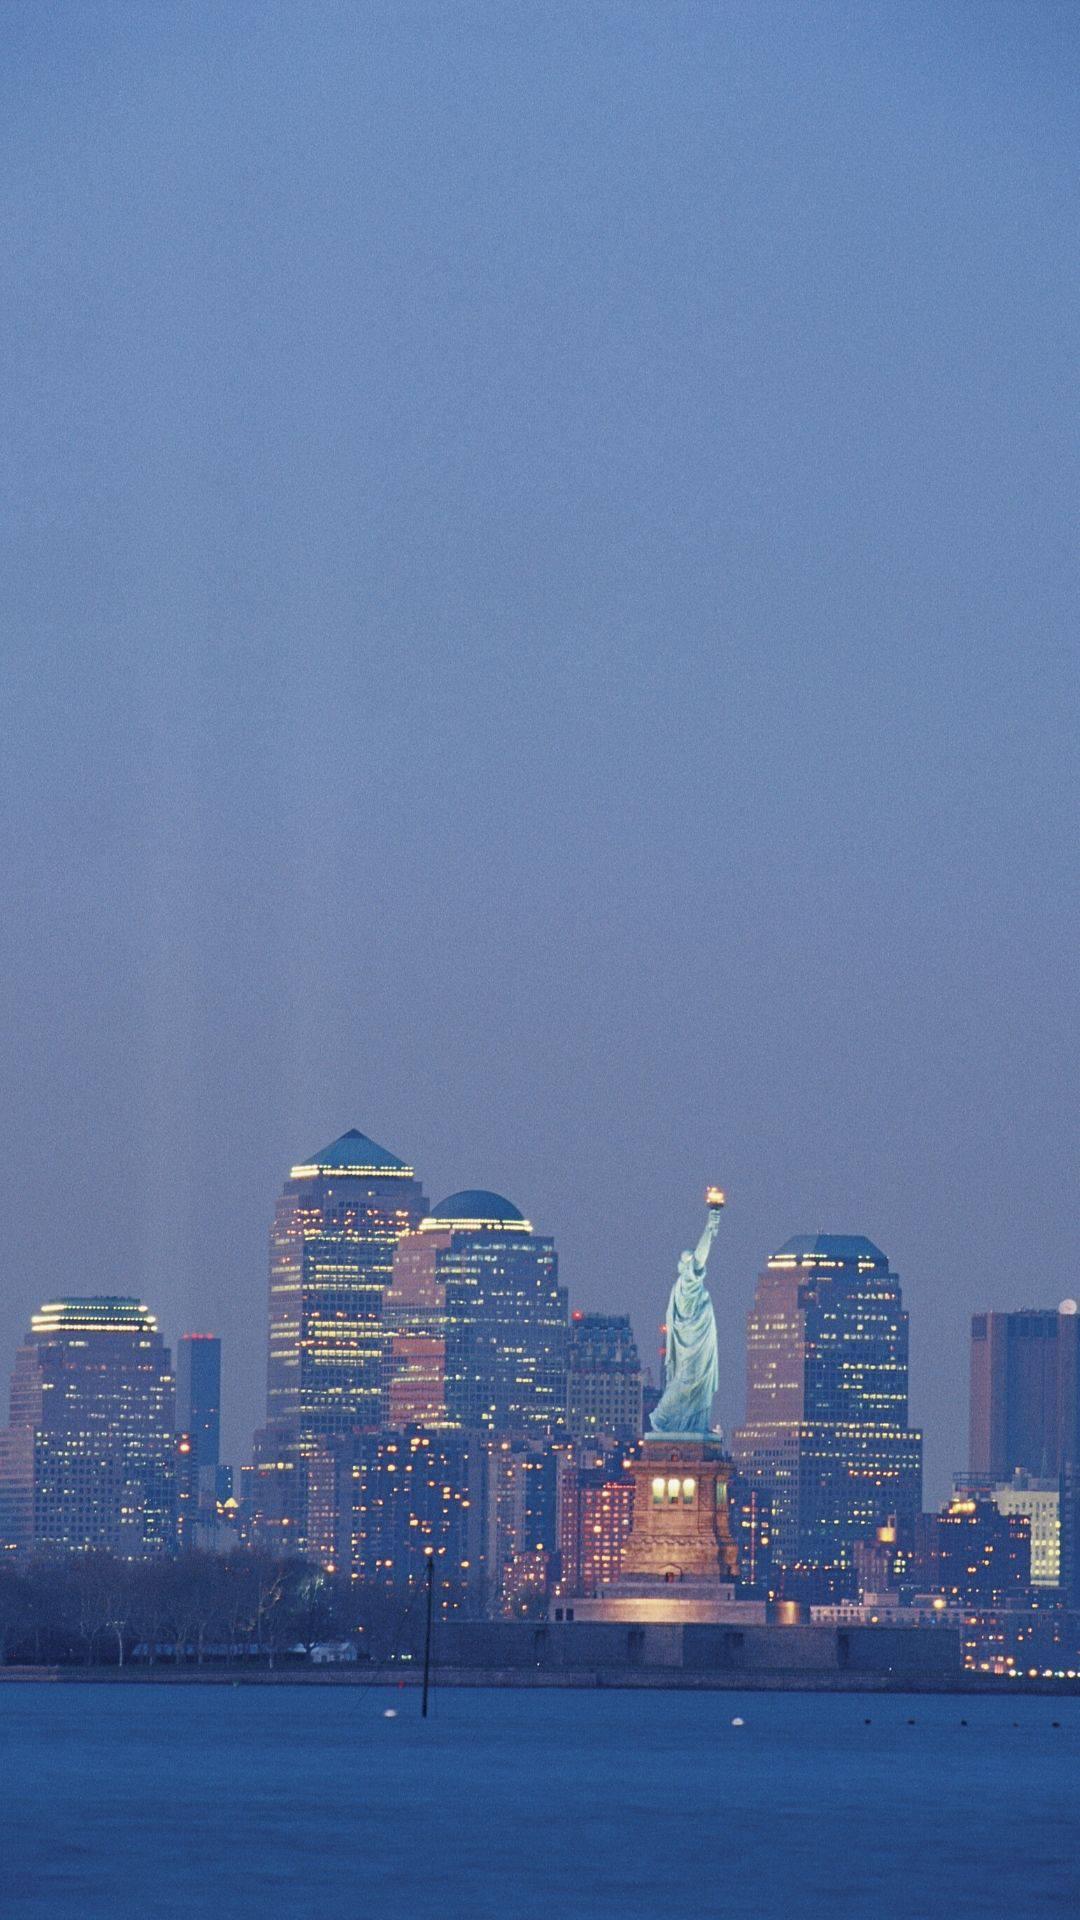 new york skyline wallpaper - Brooklyn Bridge wallpaper